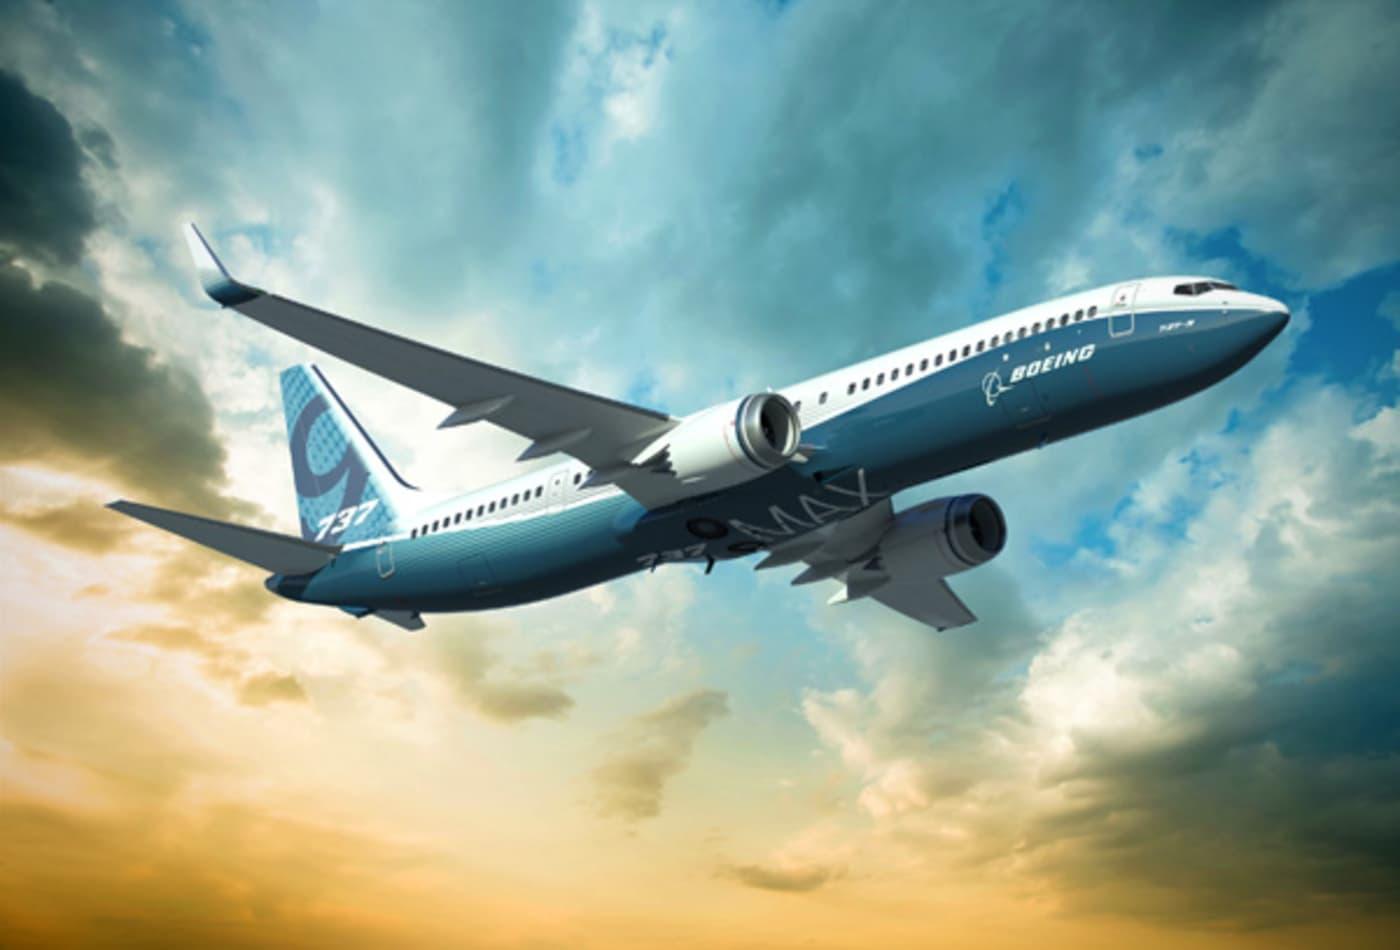 Boeing_Outta_Sight_737_Max.jpg